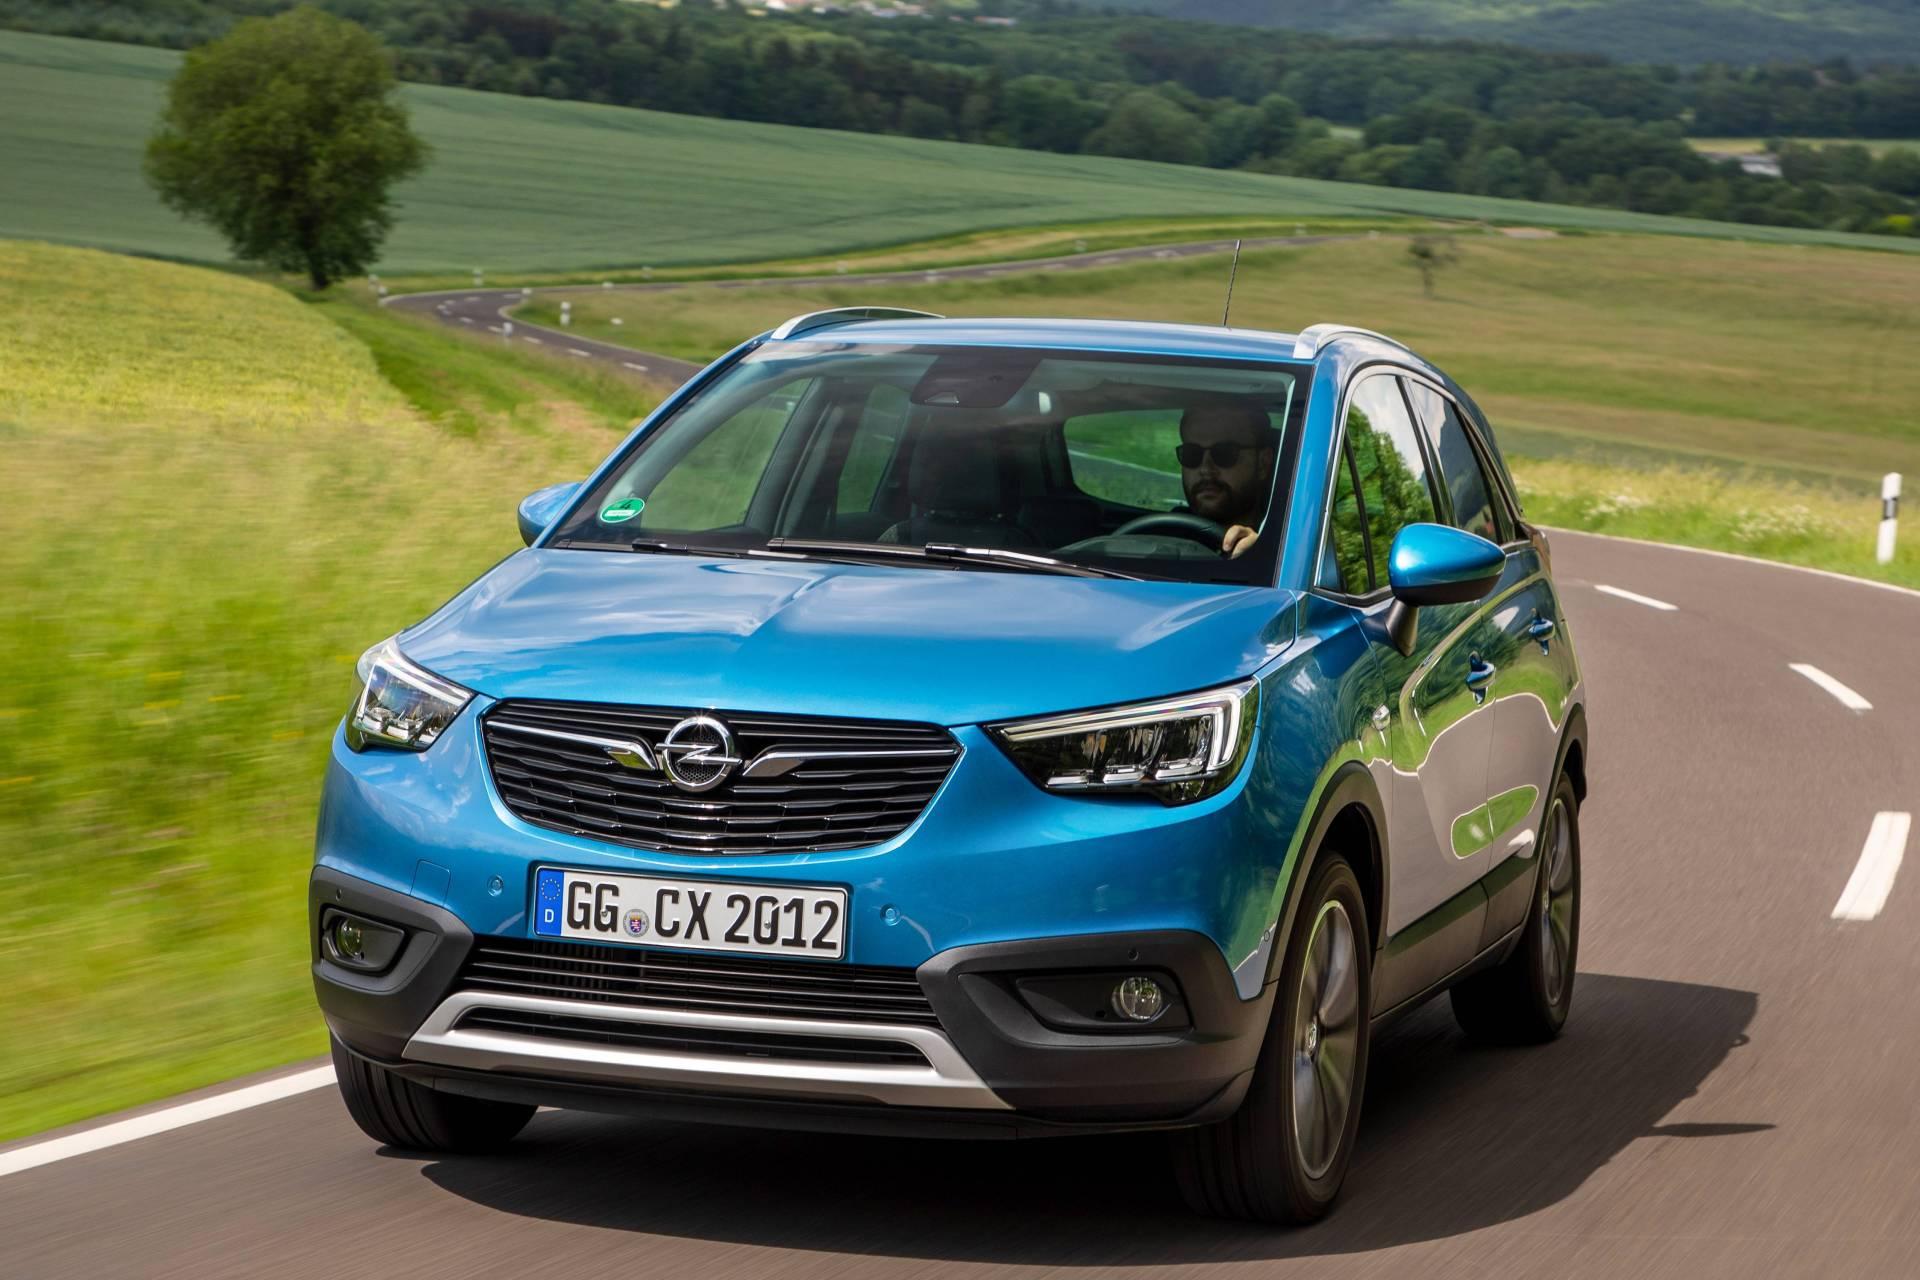 Opel Crossland X - 1.2 turbo